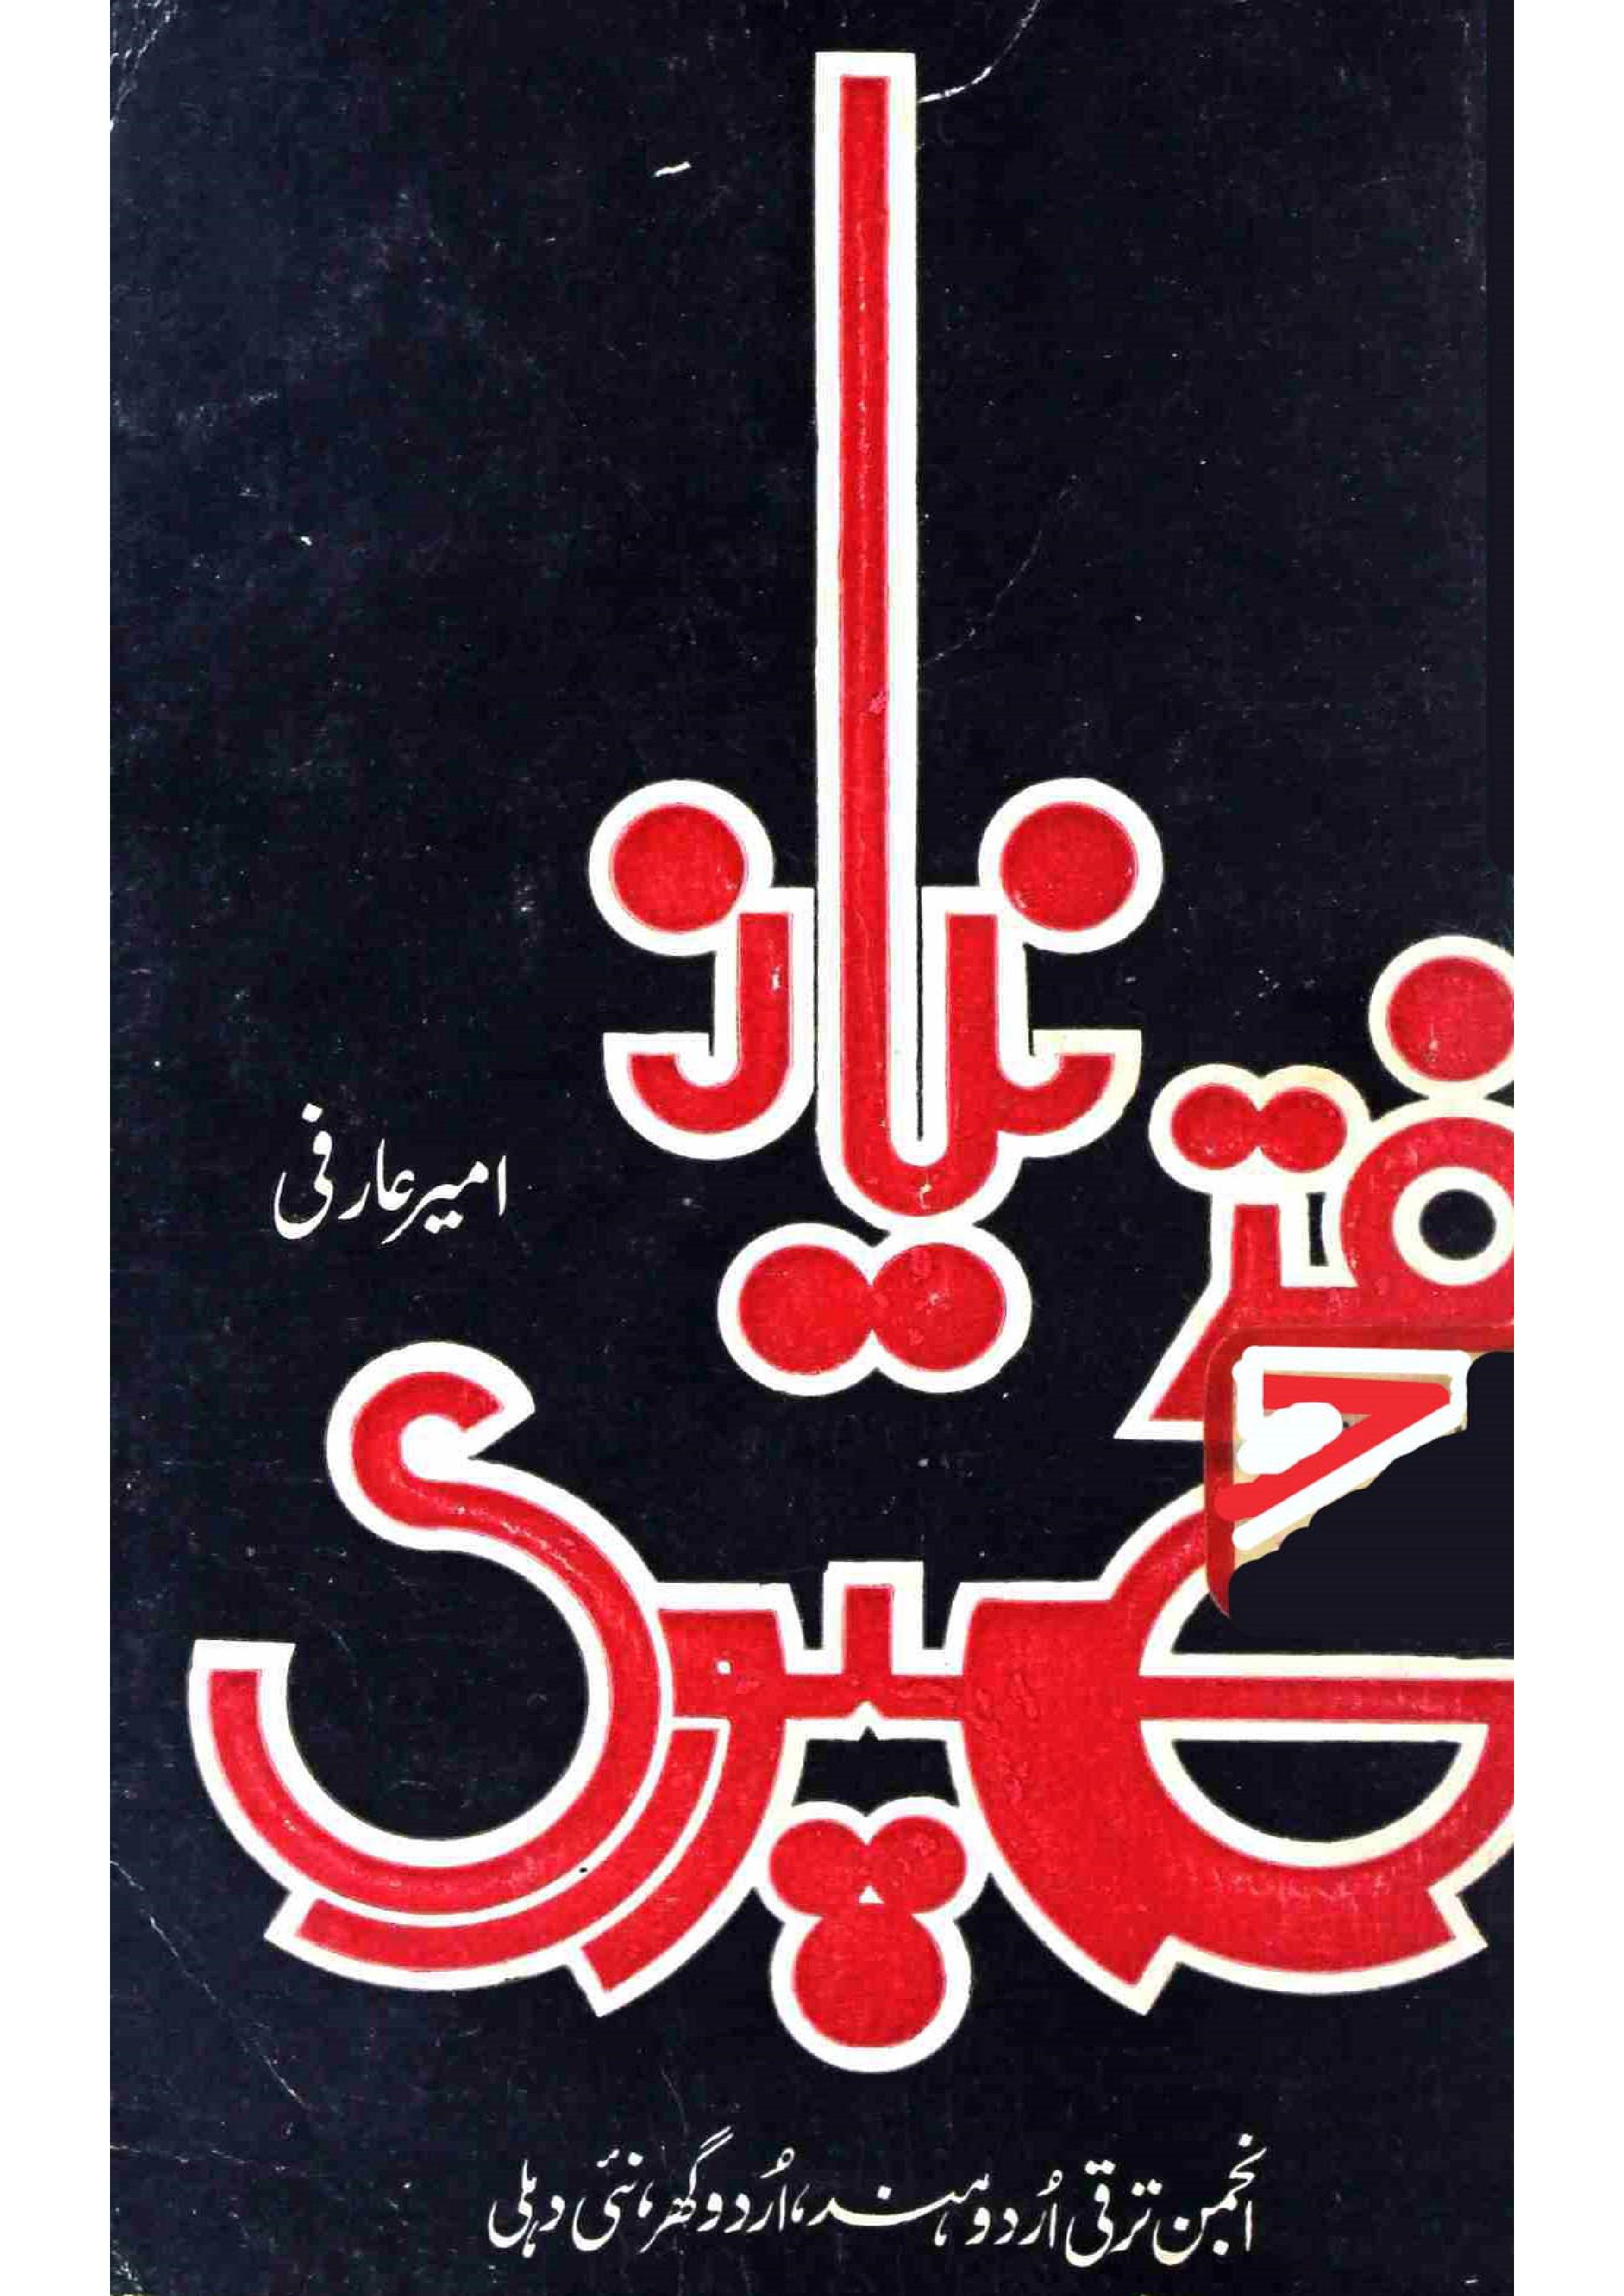 Niyaz Fatehpuri